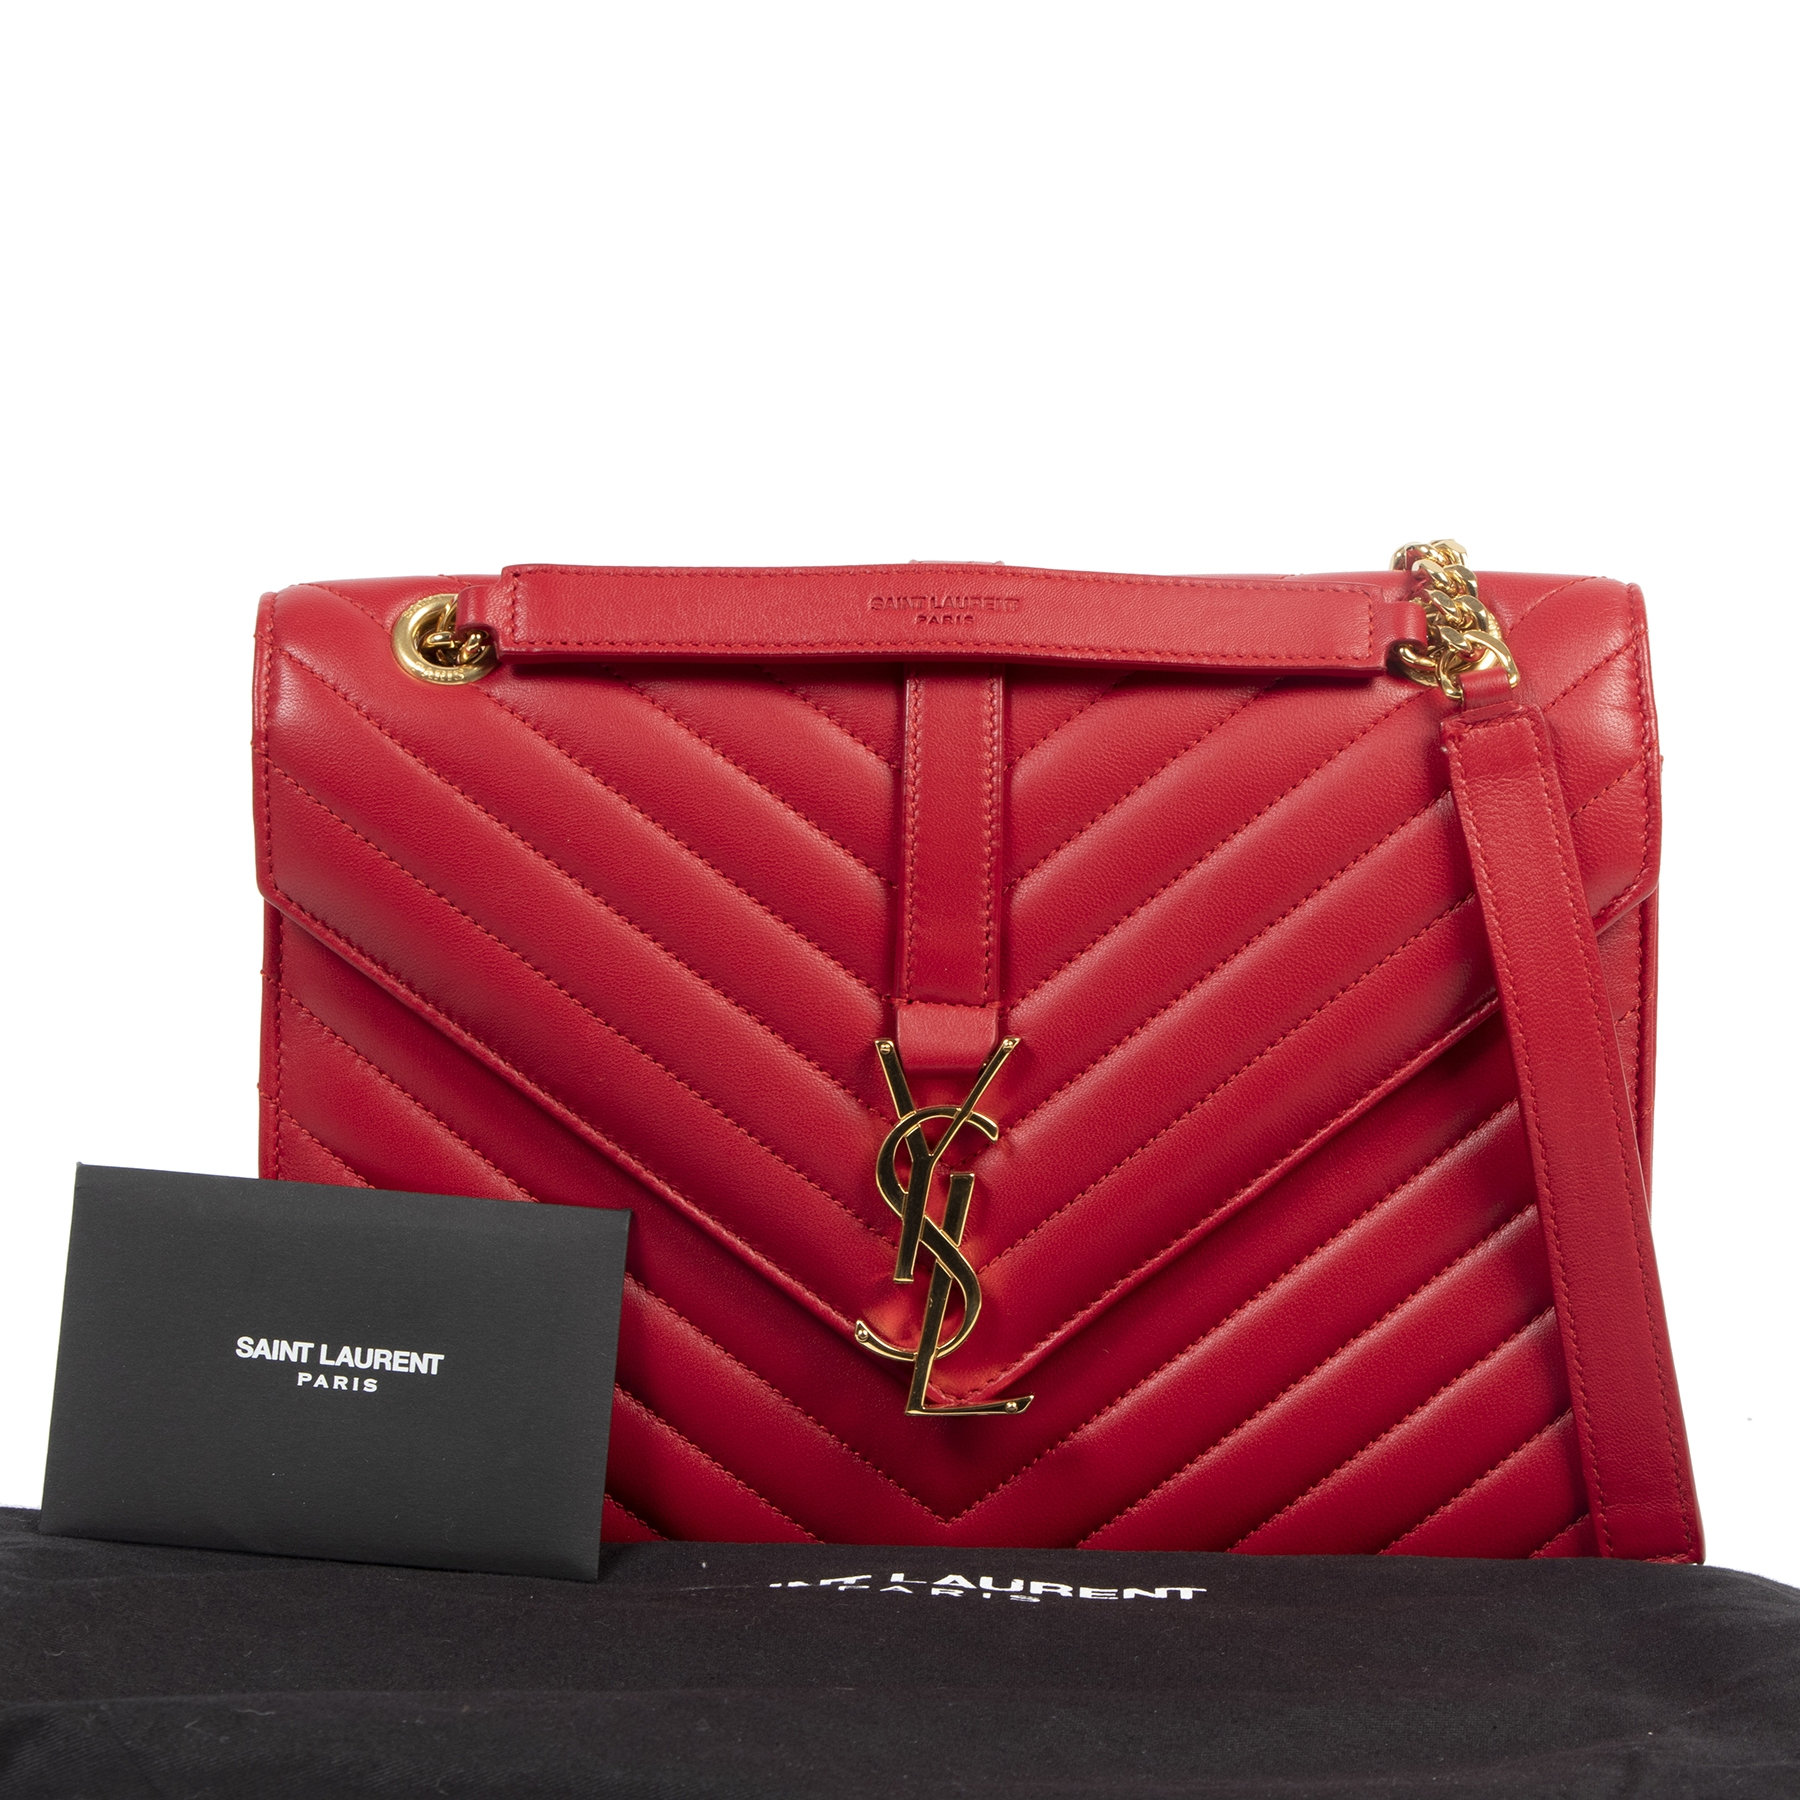 Saint Laurent Envelope Medium Red Leather Bag